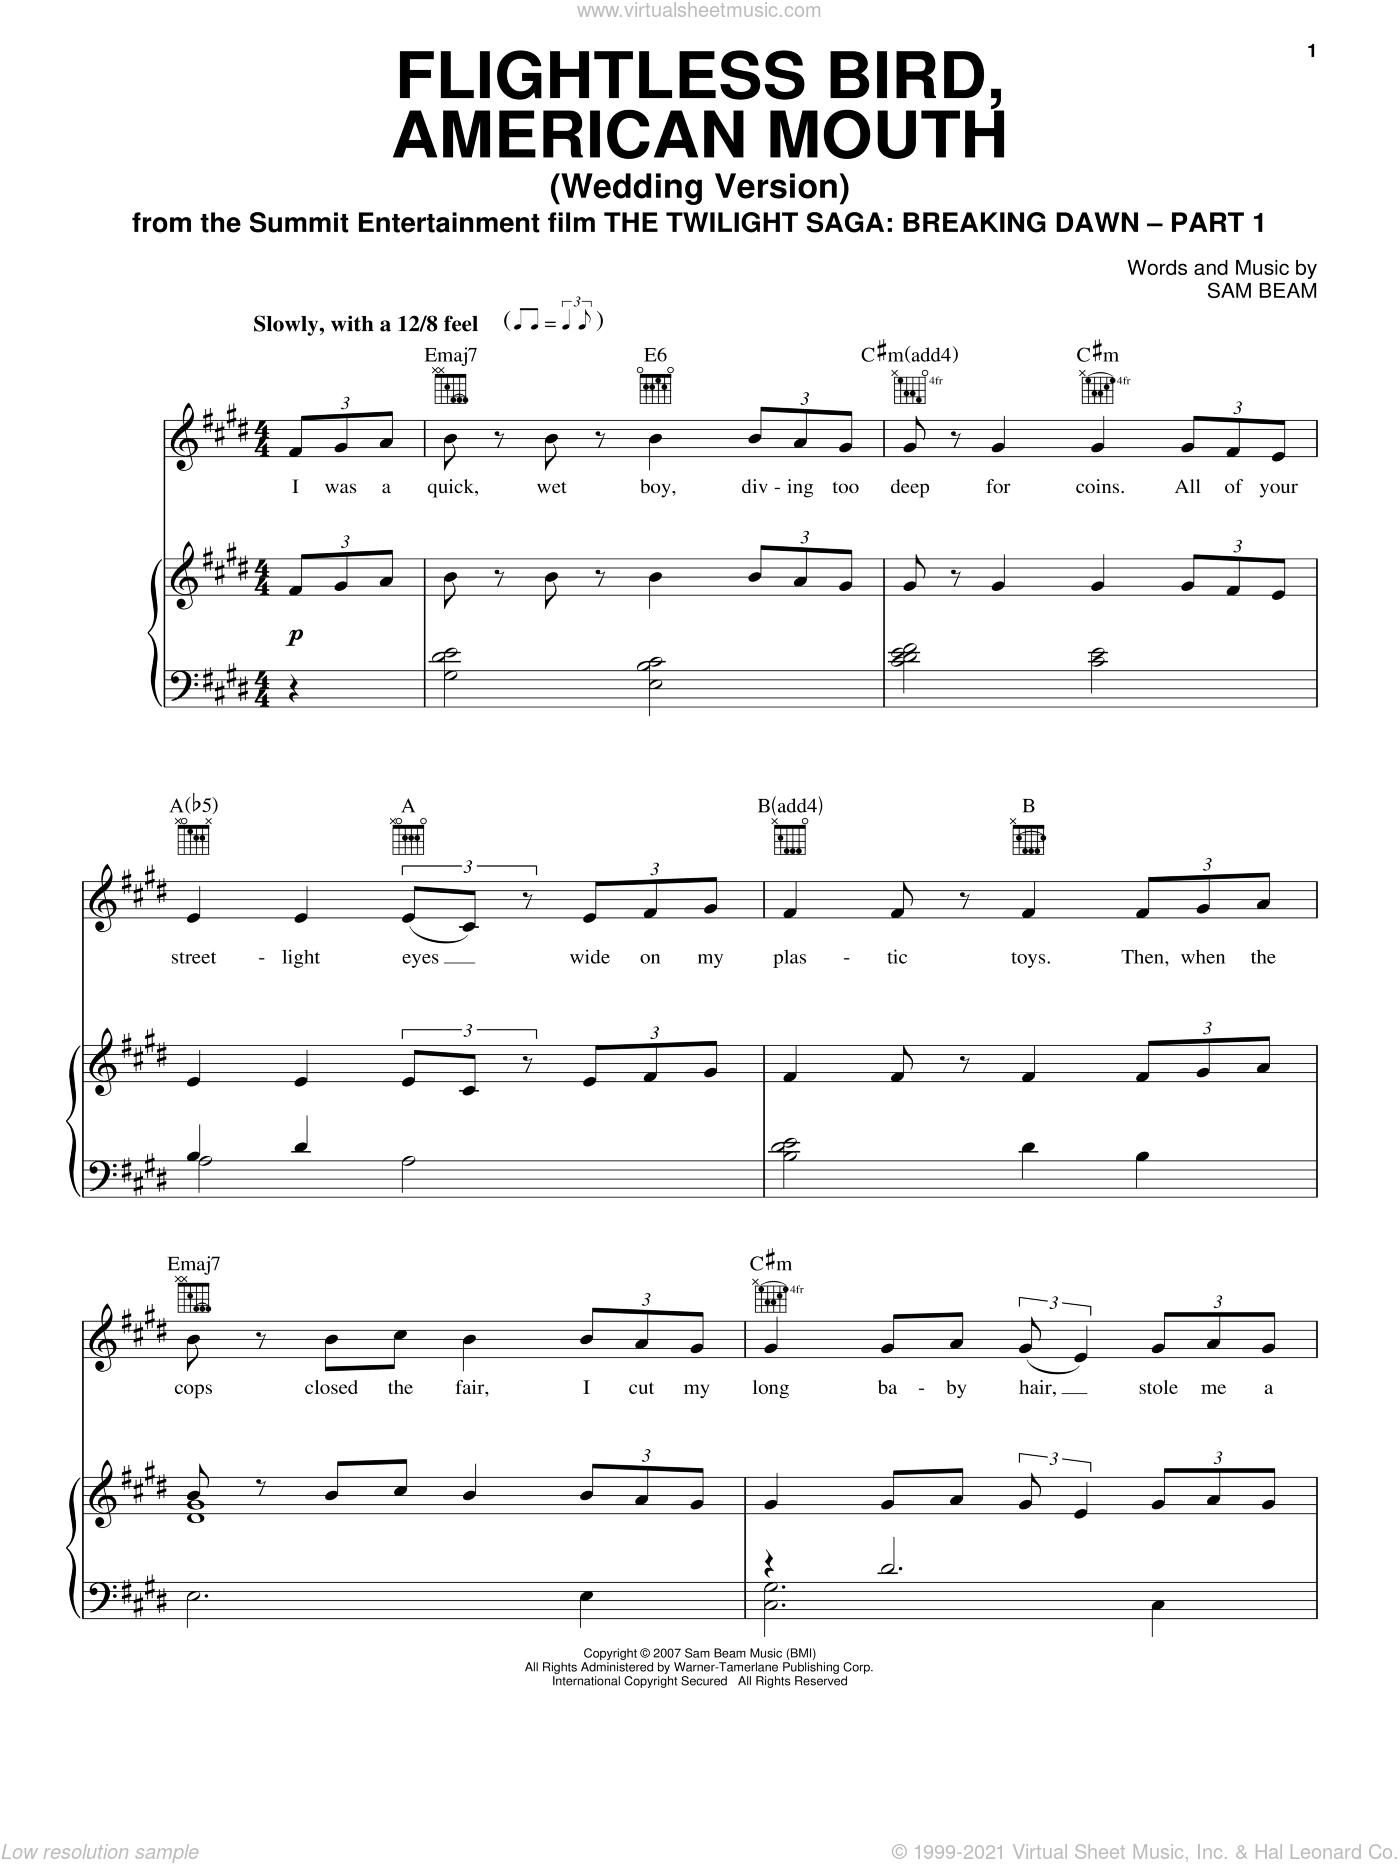 Wine Flightless Bird American Mouth Wedding Version Sheet Music